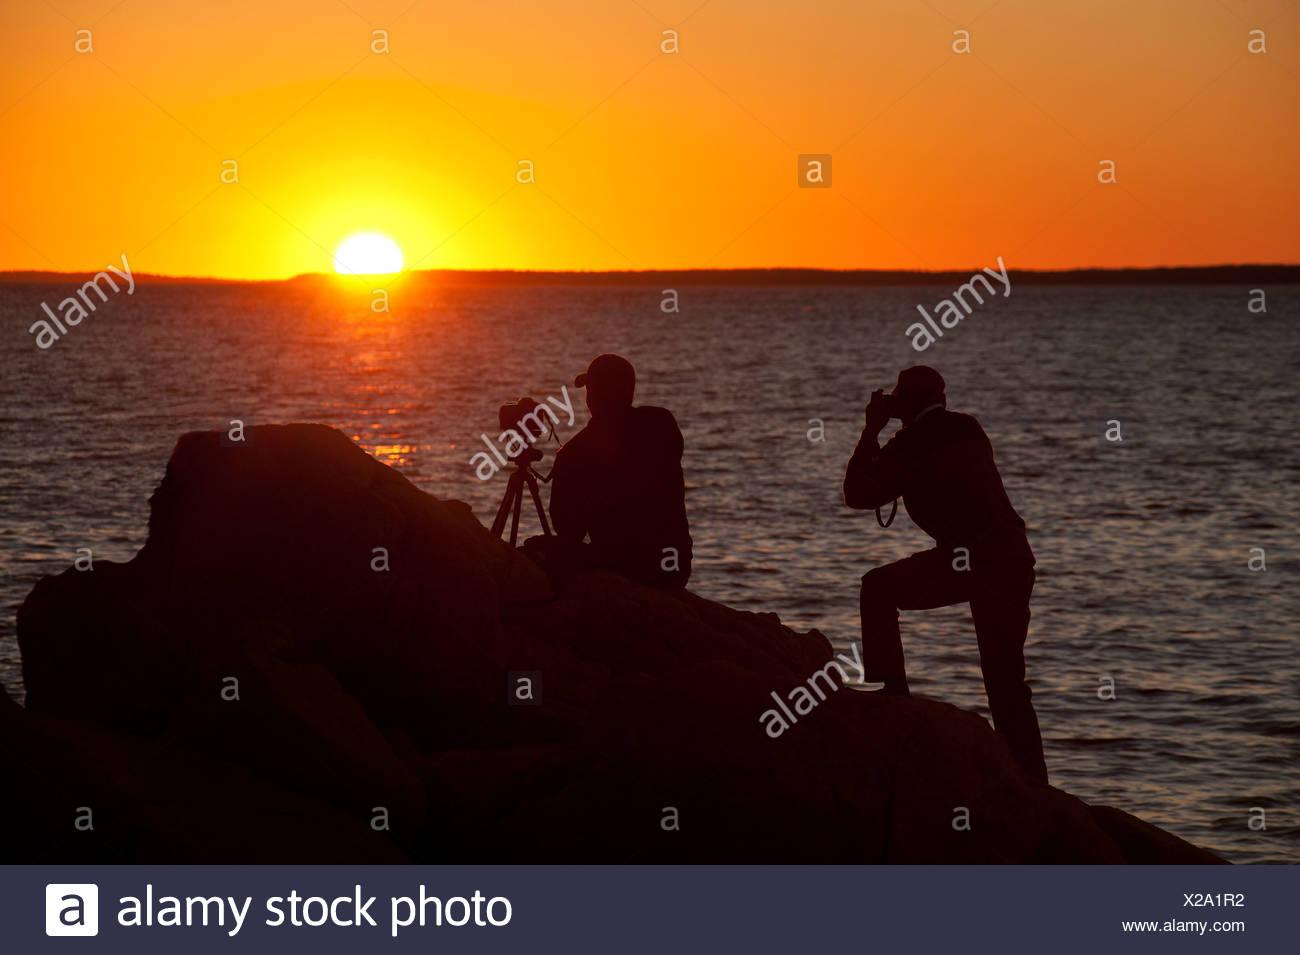 Los fotógrafos disparar atardecer costero. Foto de stock